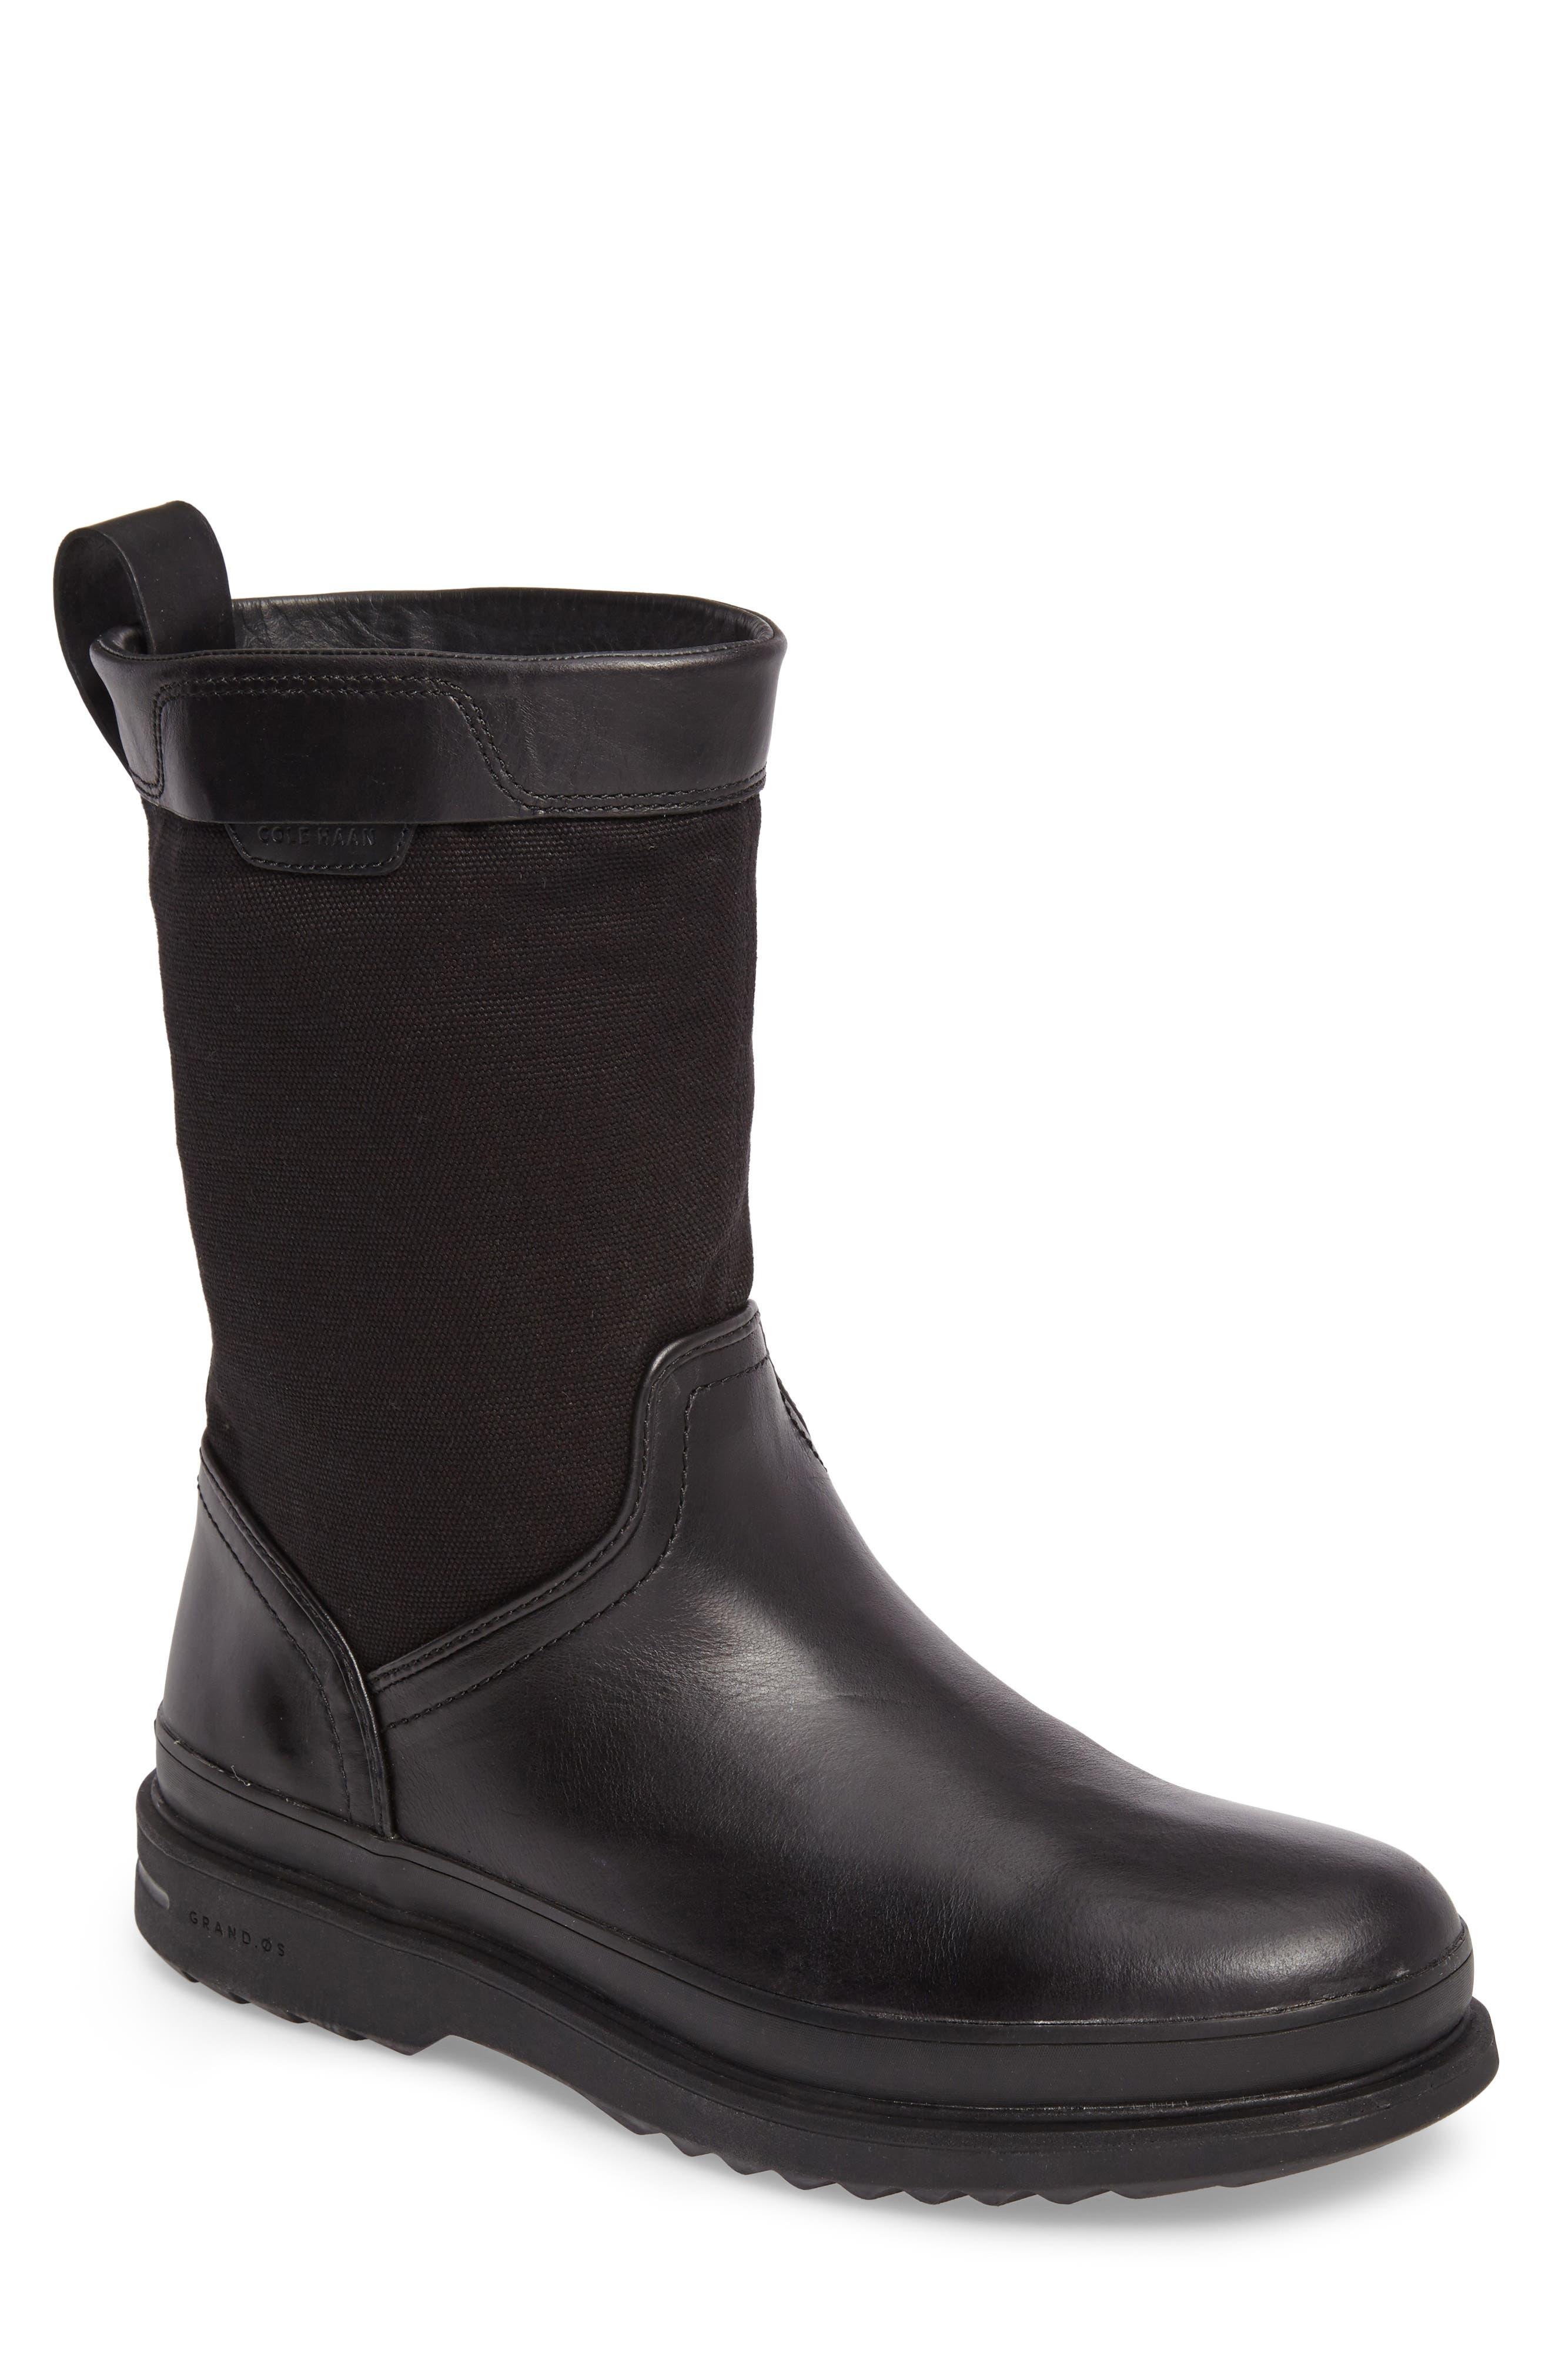 Millbridge Waterproof Boot,                             Main thumbnail 1, color,                             002